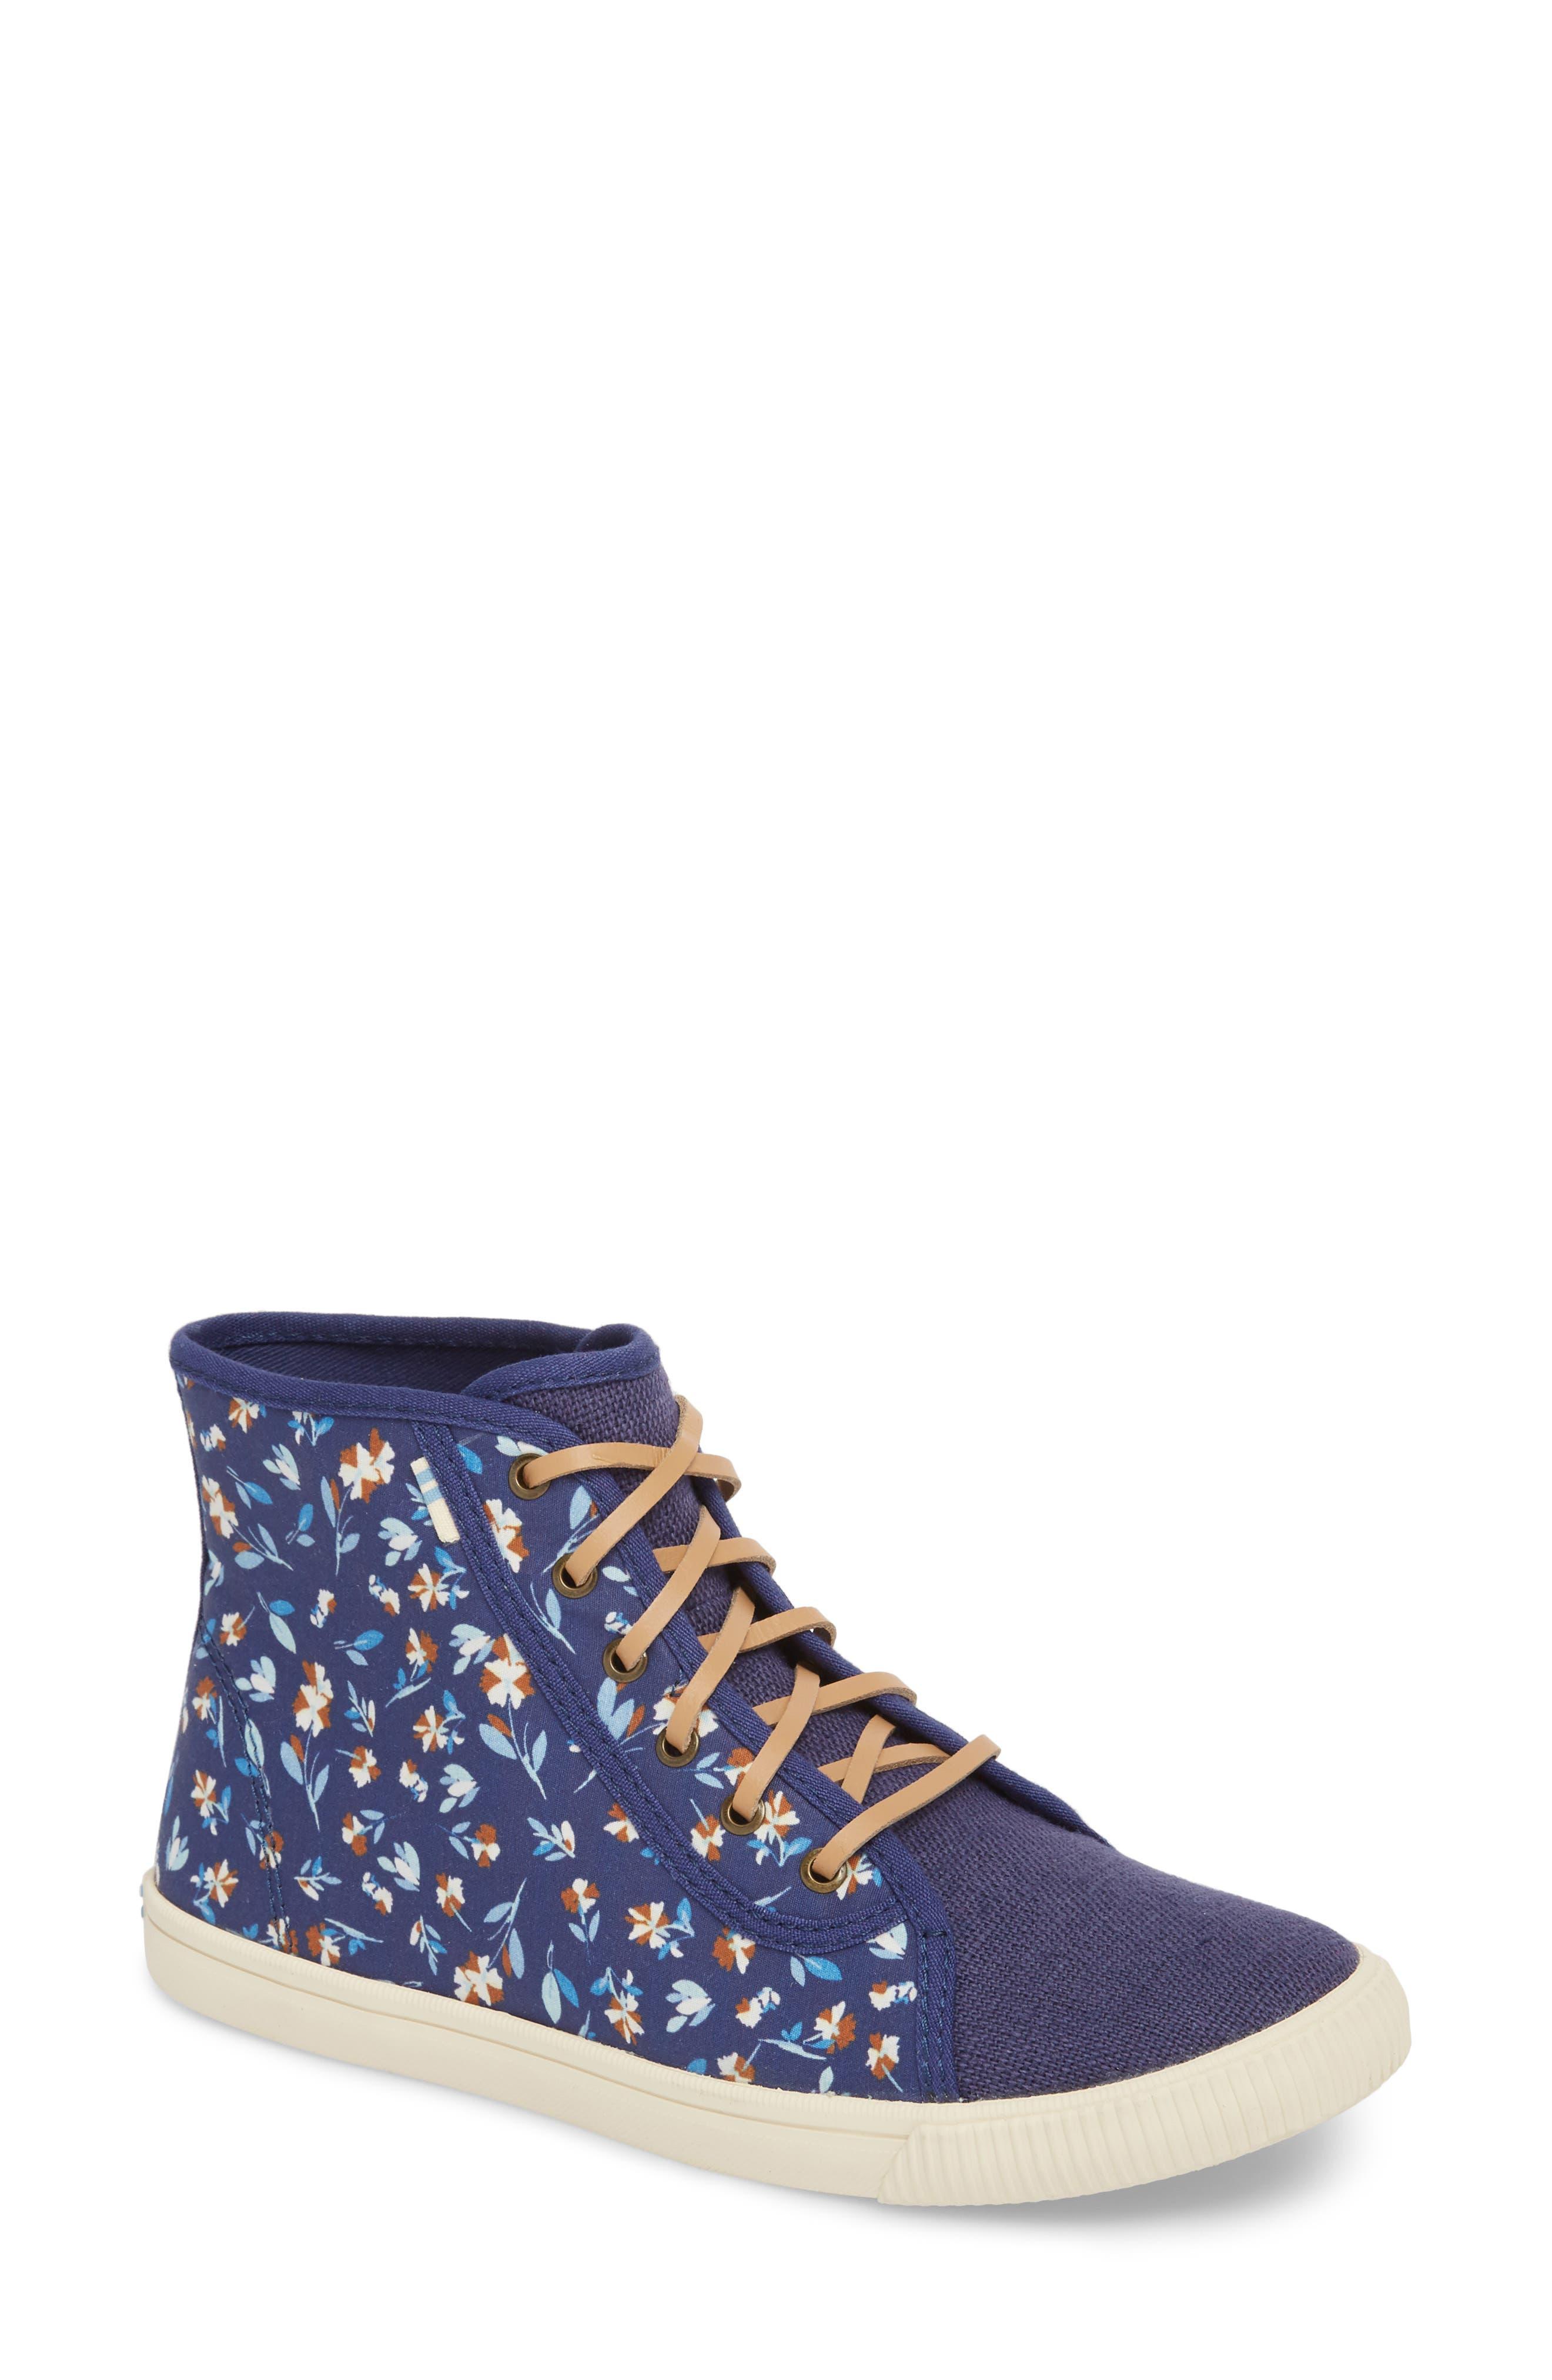 Camarillo High Top Sneaker,                             Main thumbnail 1, color,                             Deep Blue Vintage Flower